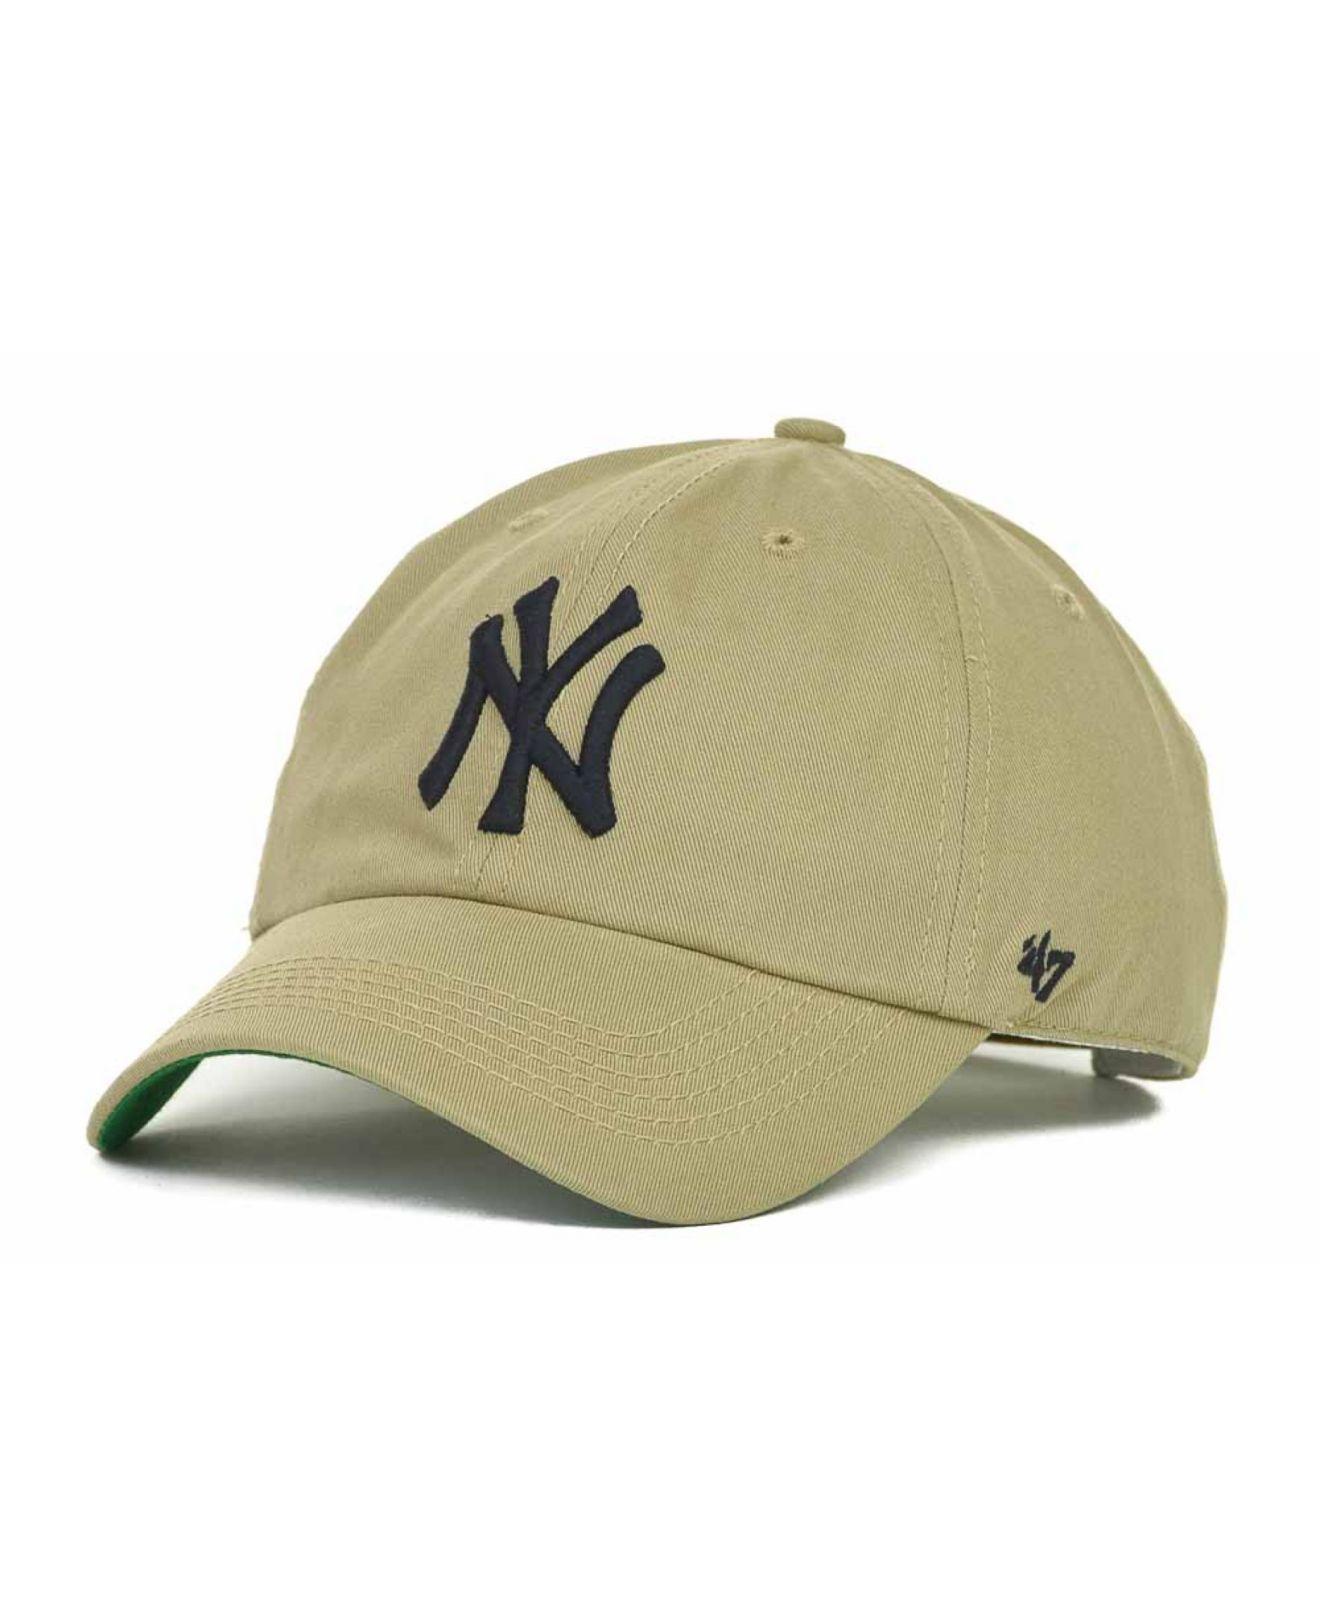 Lyst - 47 Brand New York Yankees Bergen Ii Cap in Natural for Men a705899586c